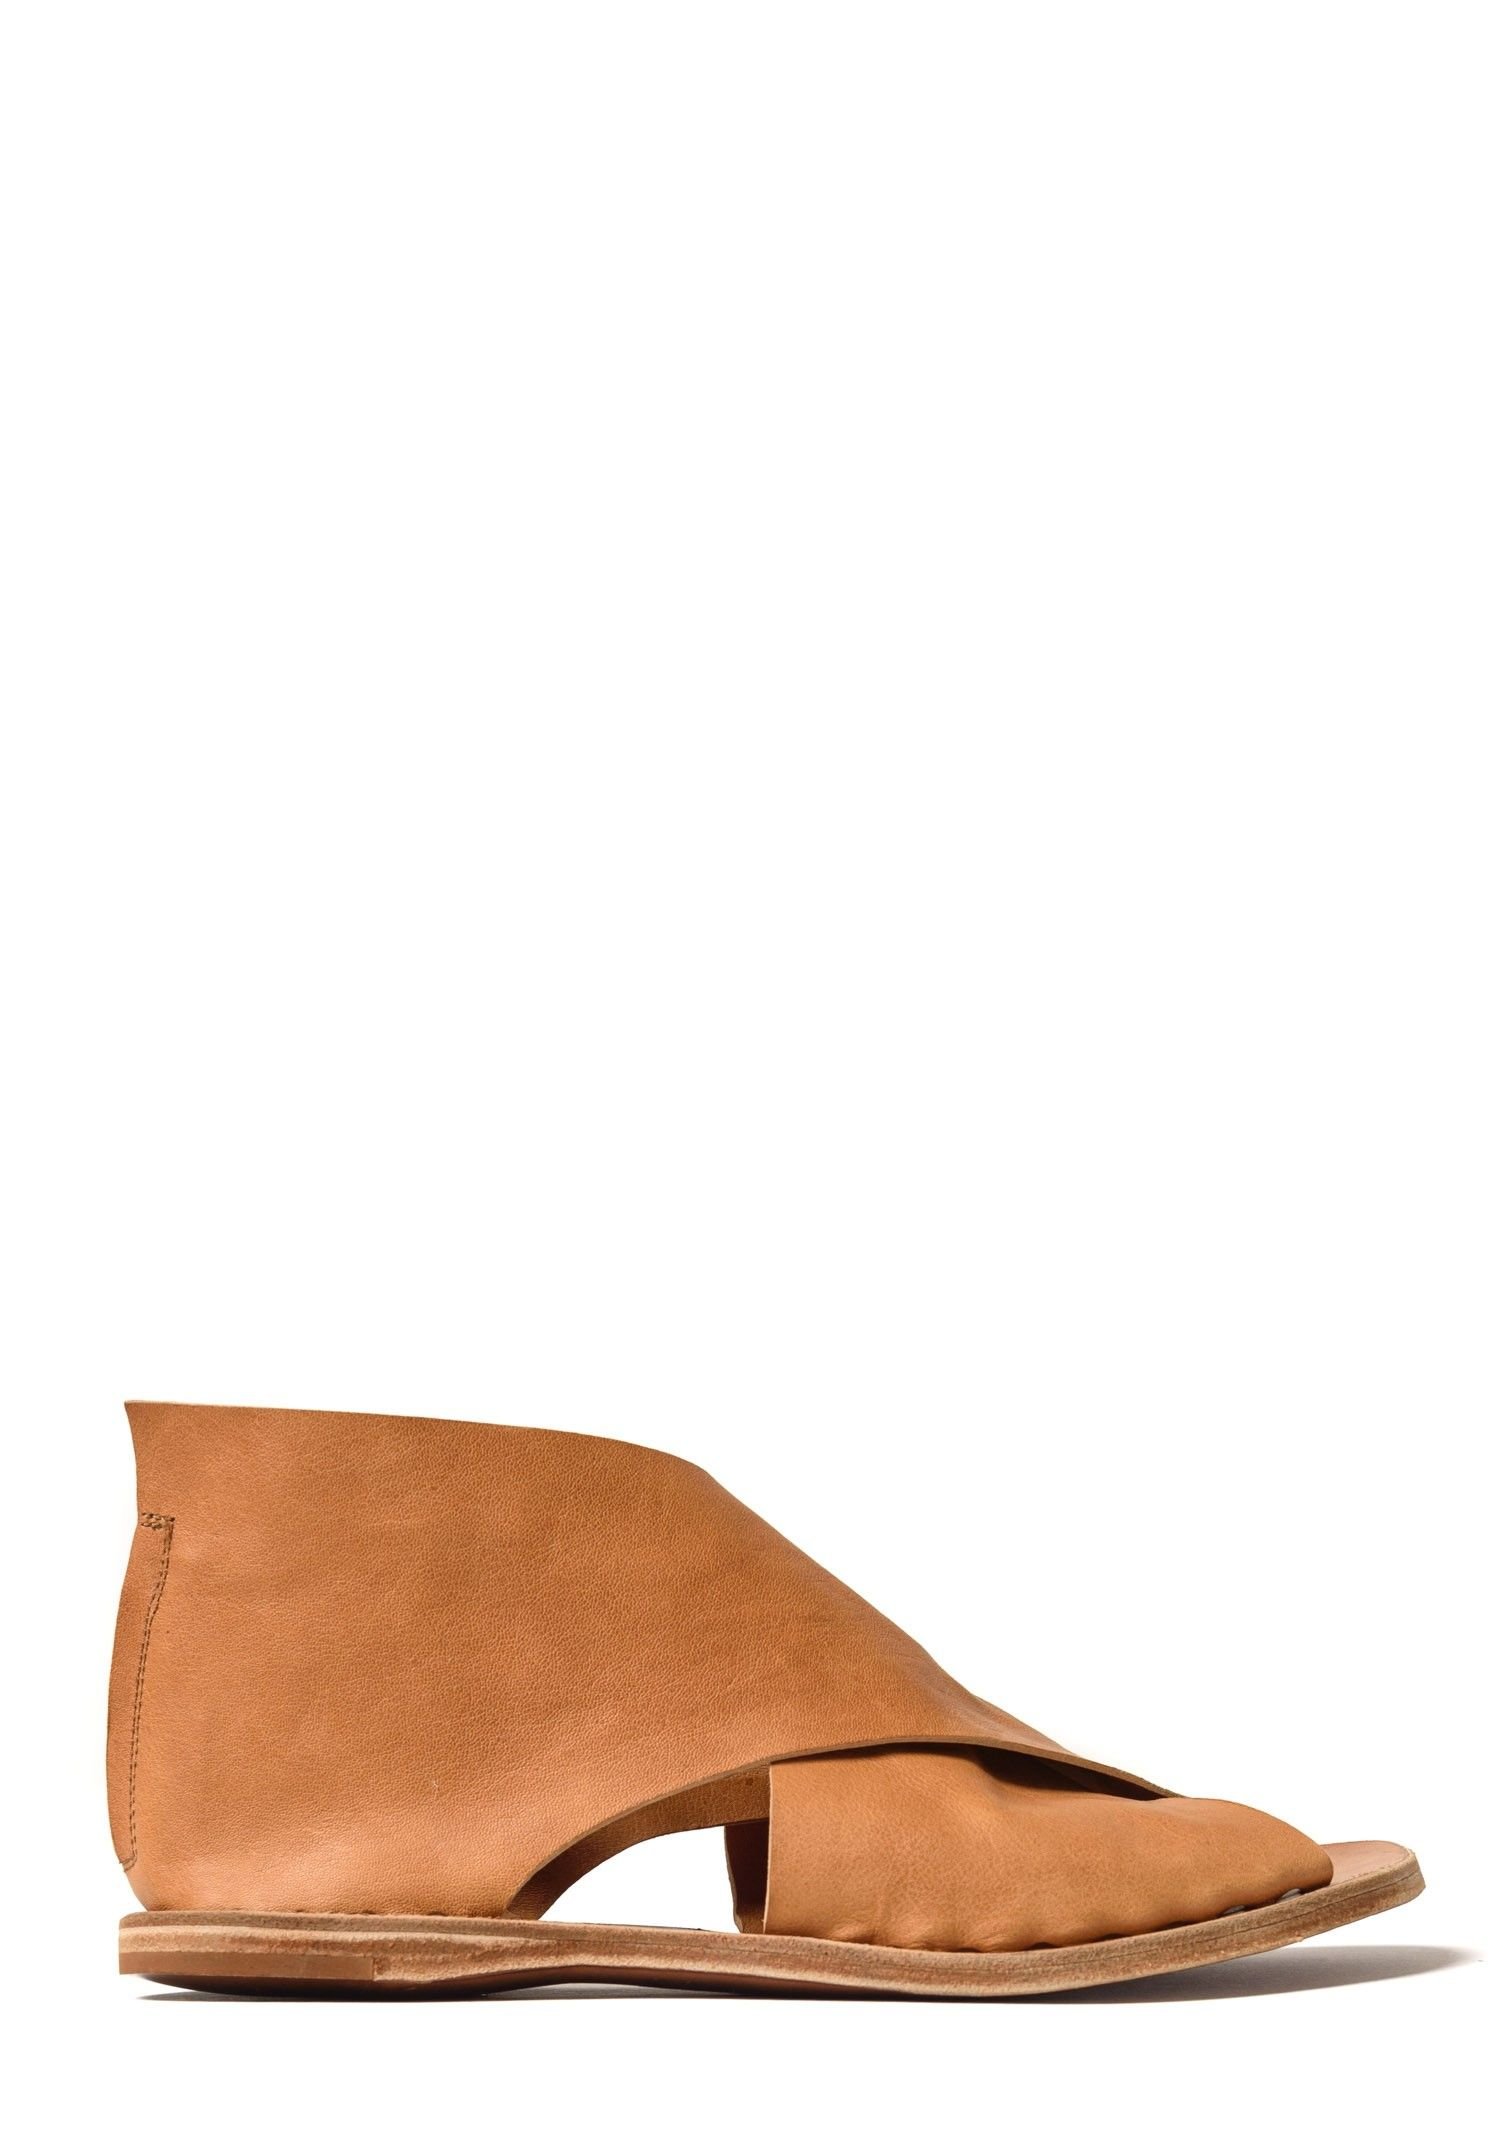 Itaca flat sandals - Nero Officine Creative Comprar Barato Excelente Comprar Barato Envío Barato Liquidación En Línea 2zUiwH3X1Q